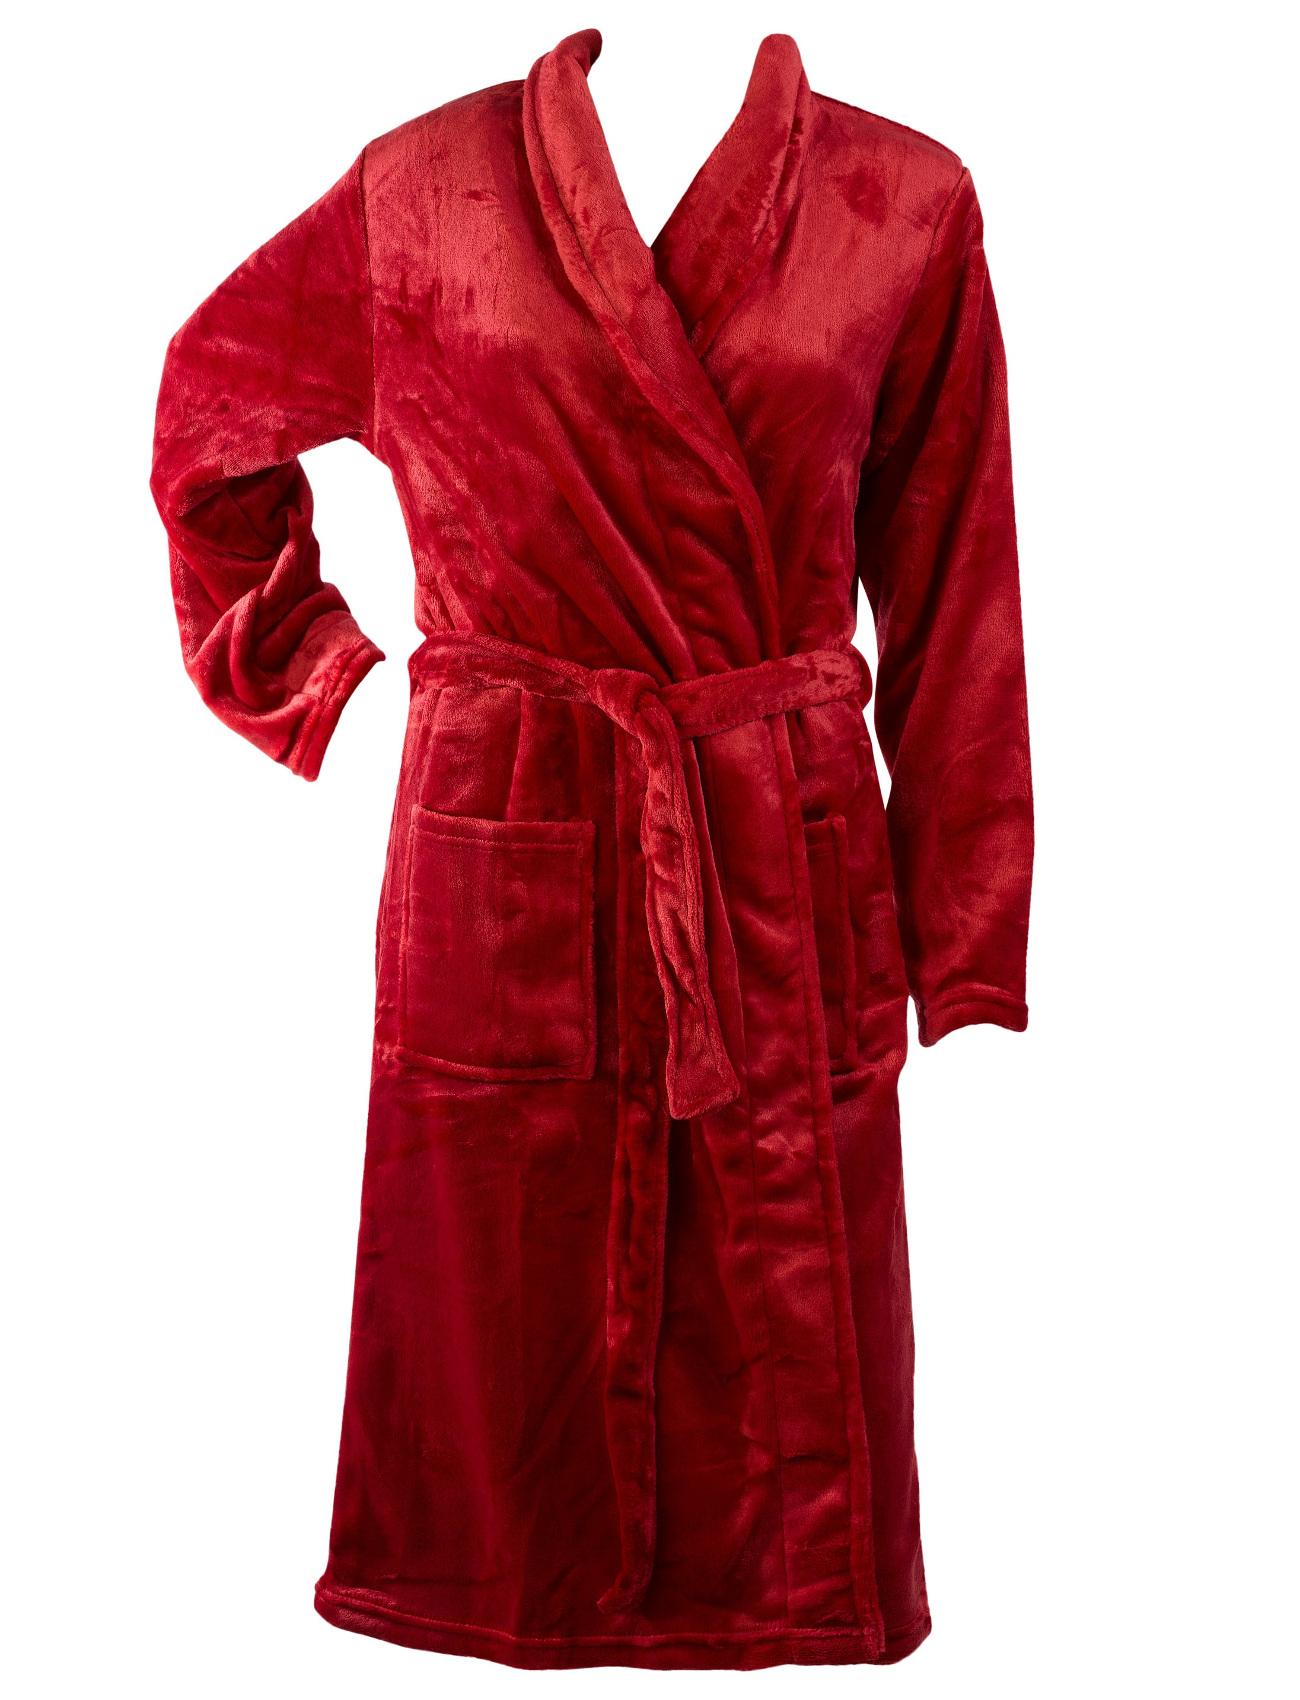 Bath Robe Womens Soft Thick Fleece Plain Shawl Collar Wrap Around ...